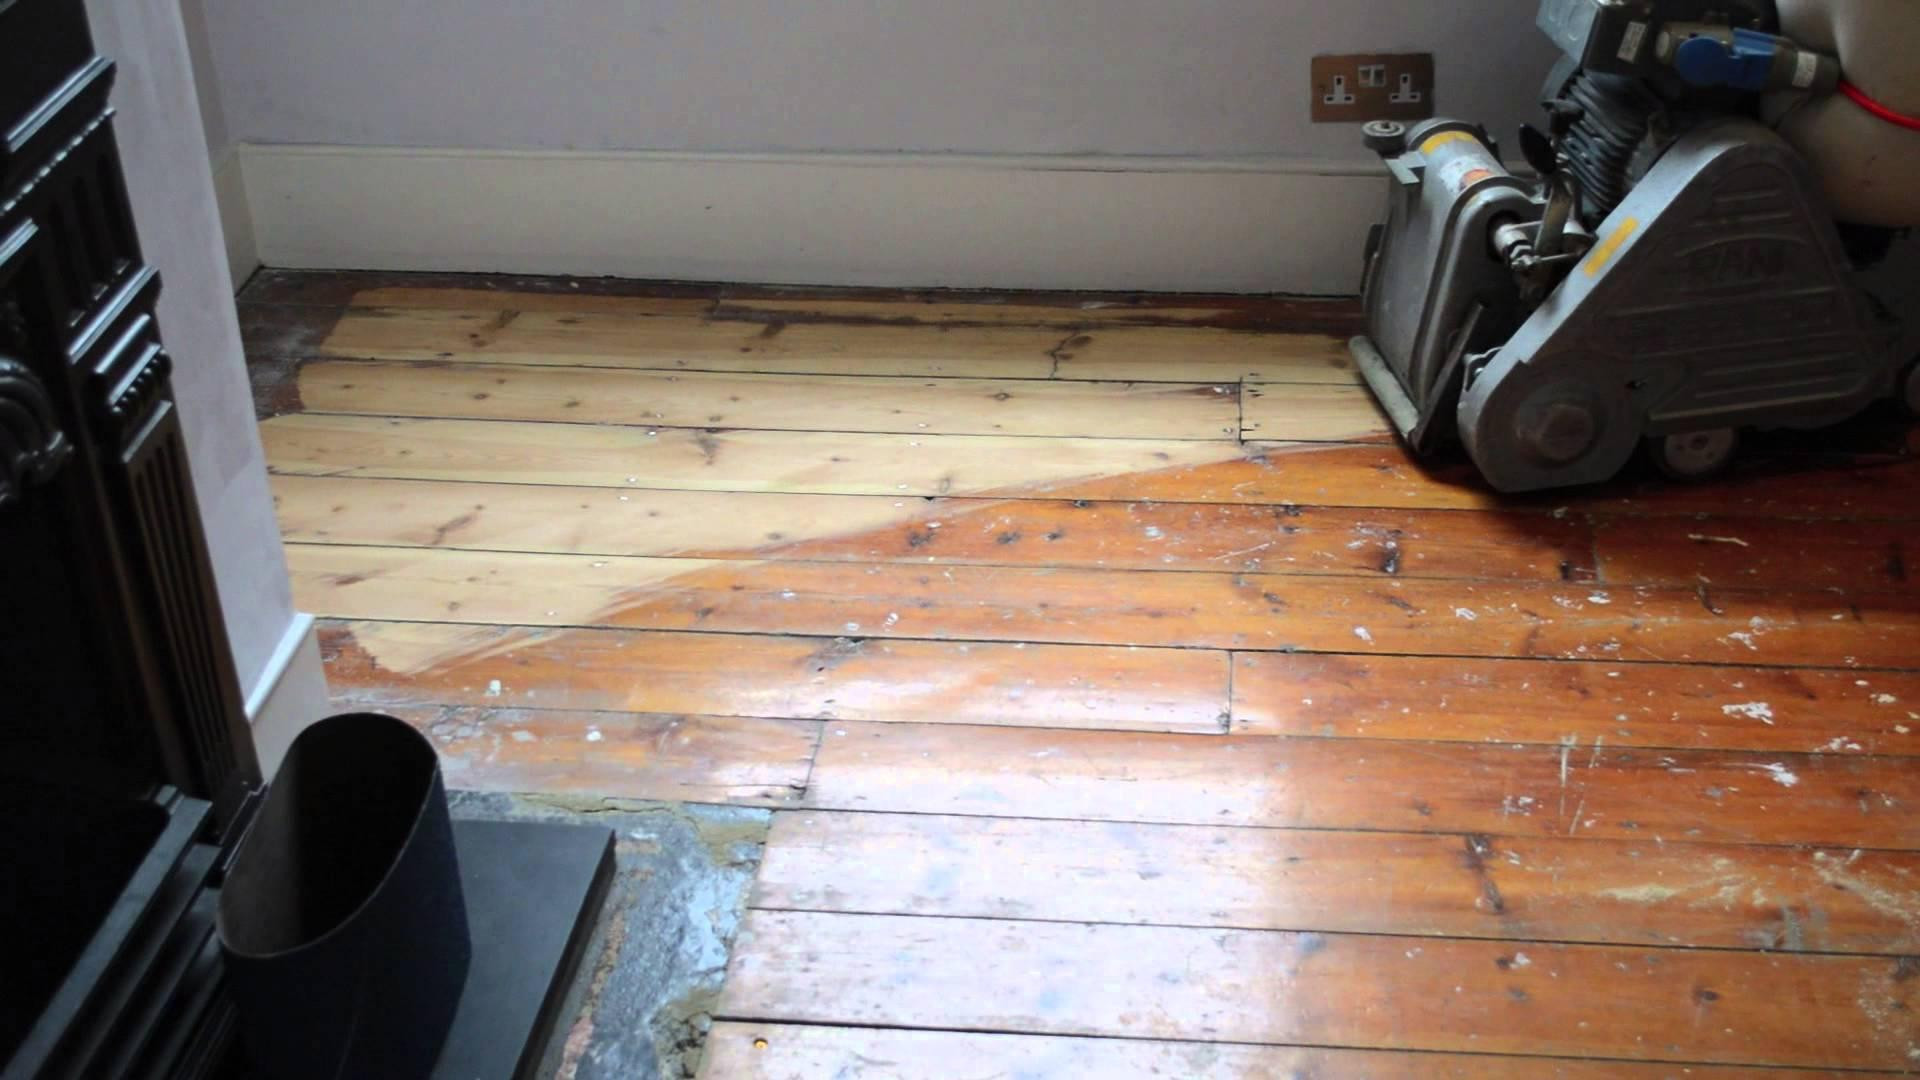 Hardwood Flooring Youtube Of Luxury Of Diy Wood Floor Refinishing Collection In Diy Wood Floor Refinishing Unique Floor Sanding with Frank Belt Sander 24 Grit Belt